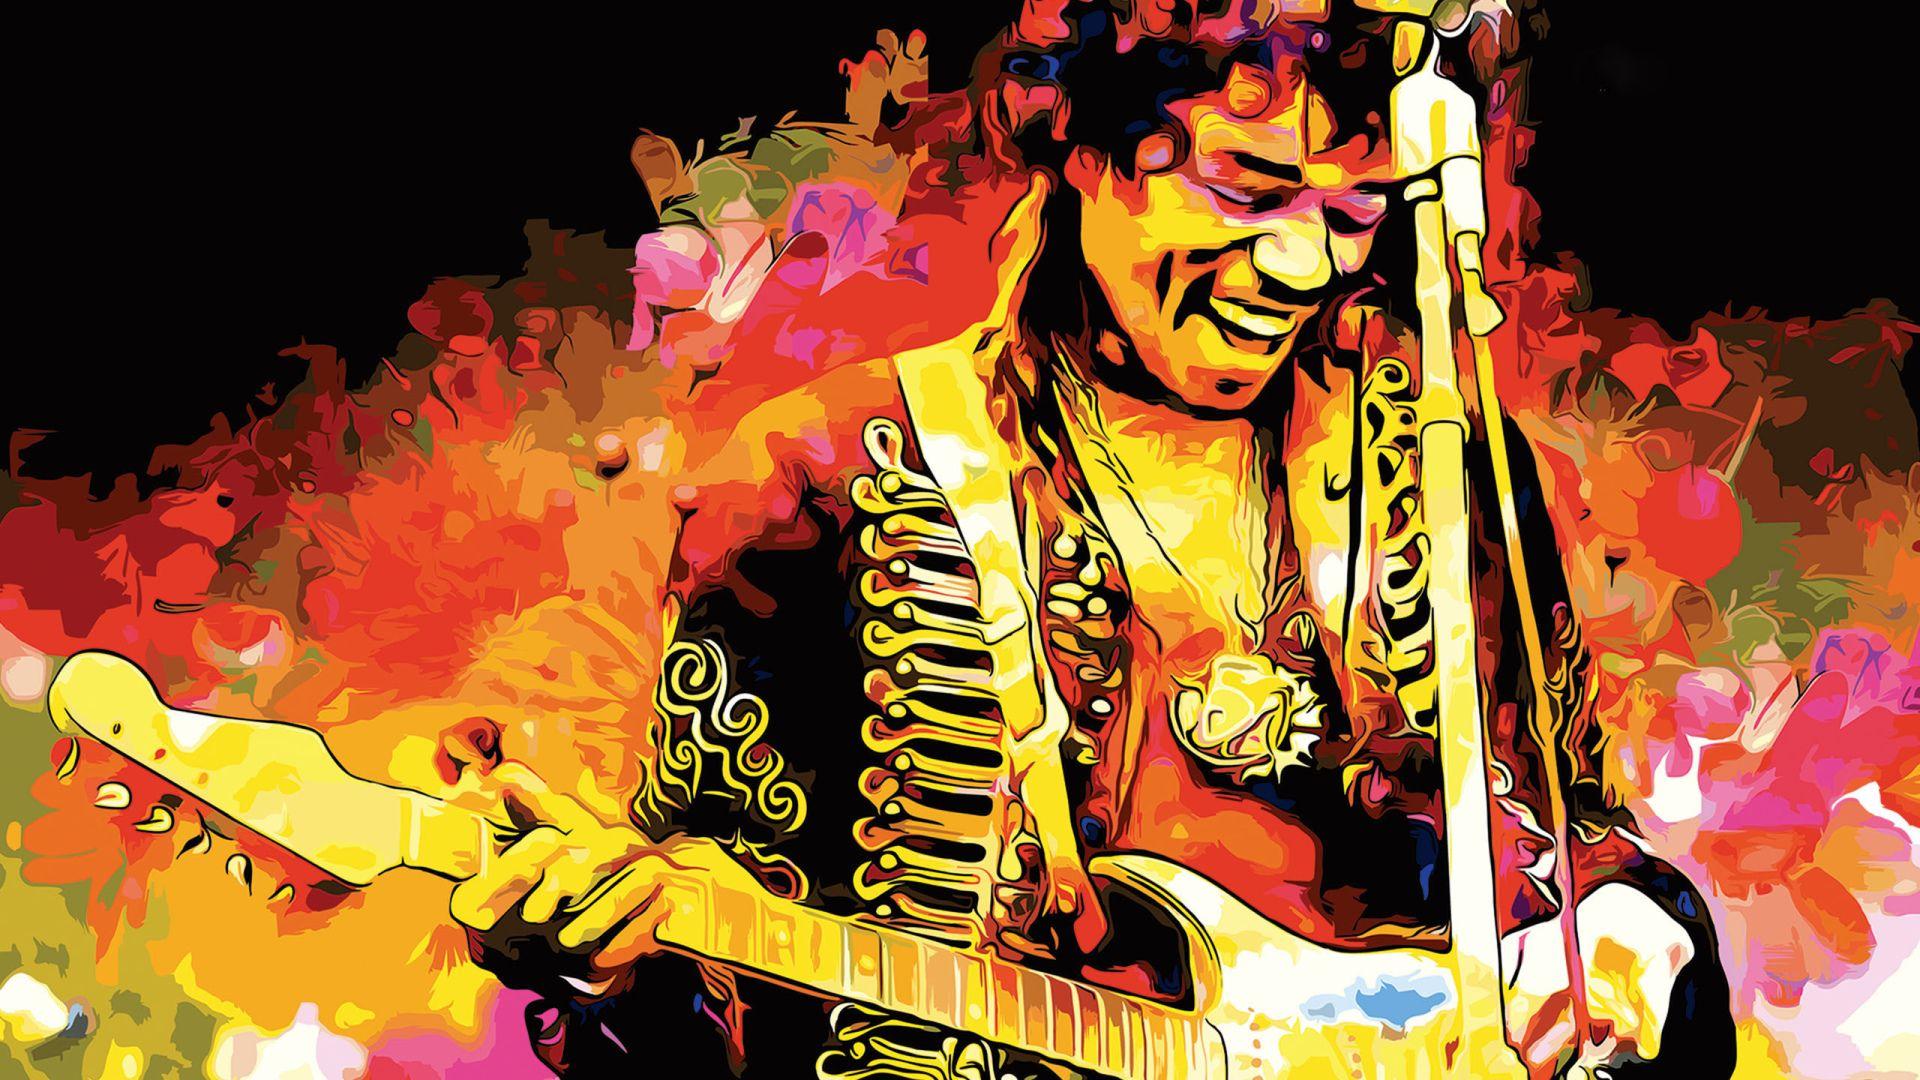 Music Jimi Hendrix Music Guitar Colors Colorful Wallpaper Guitar Illustration Jimi Hendrix Hendrix